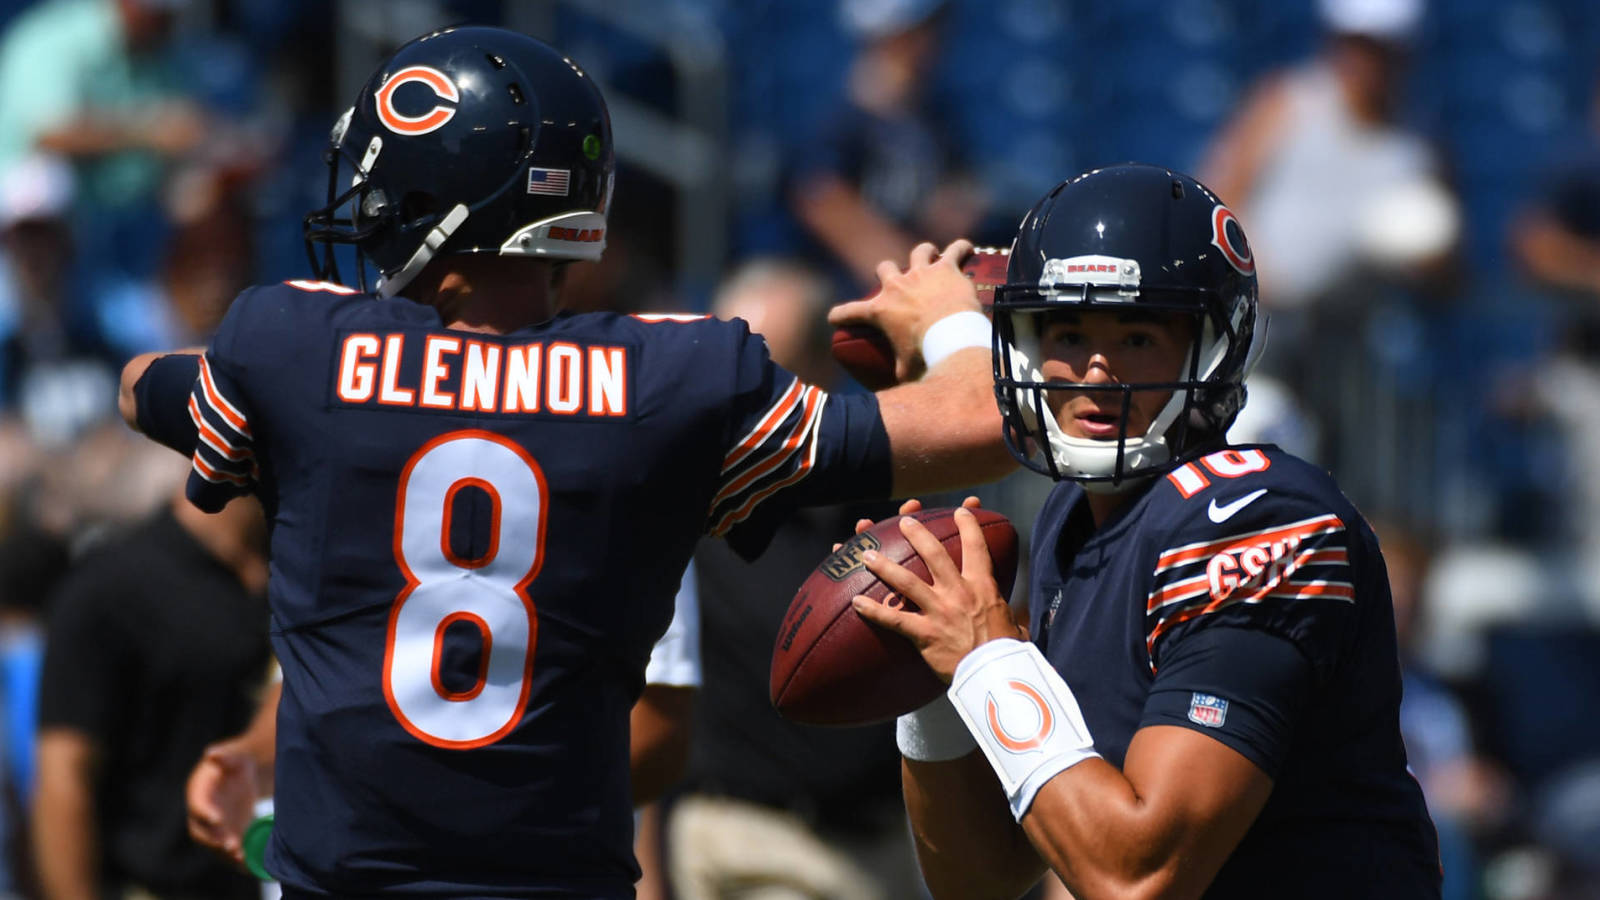 4e3aac08b2e Mike Glennon Bleacher Report Aug 27, 2017 Nashville, TN, USA Bears  quarterbacks Mike Glennon (8) ...